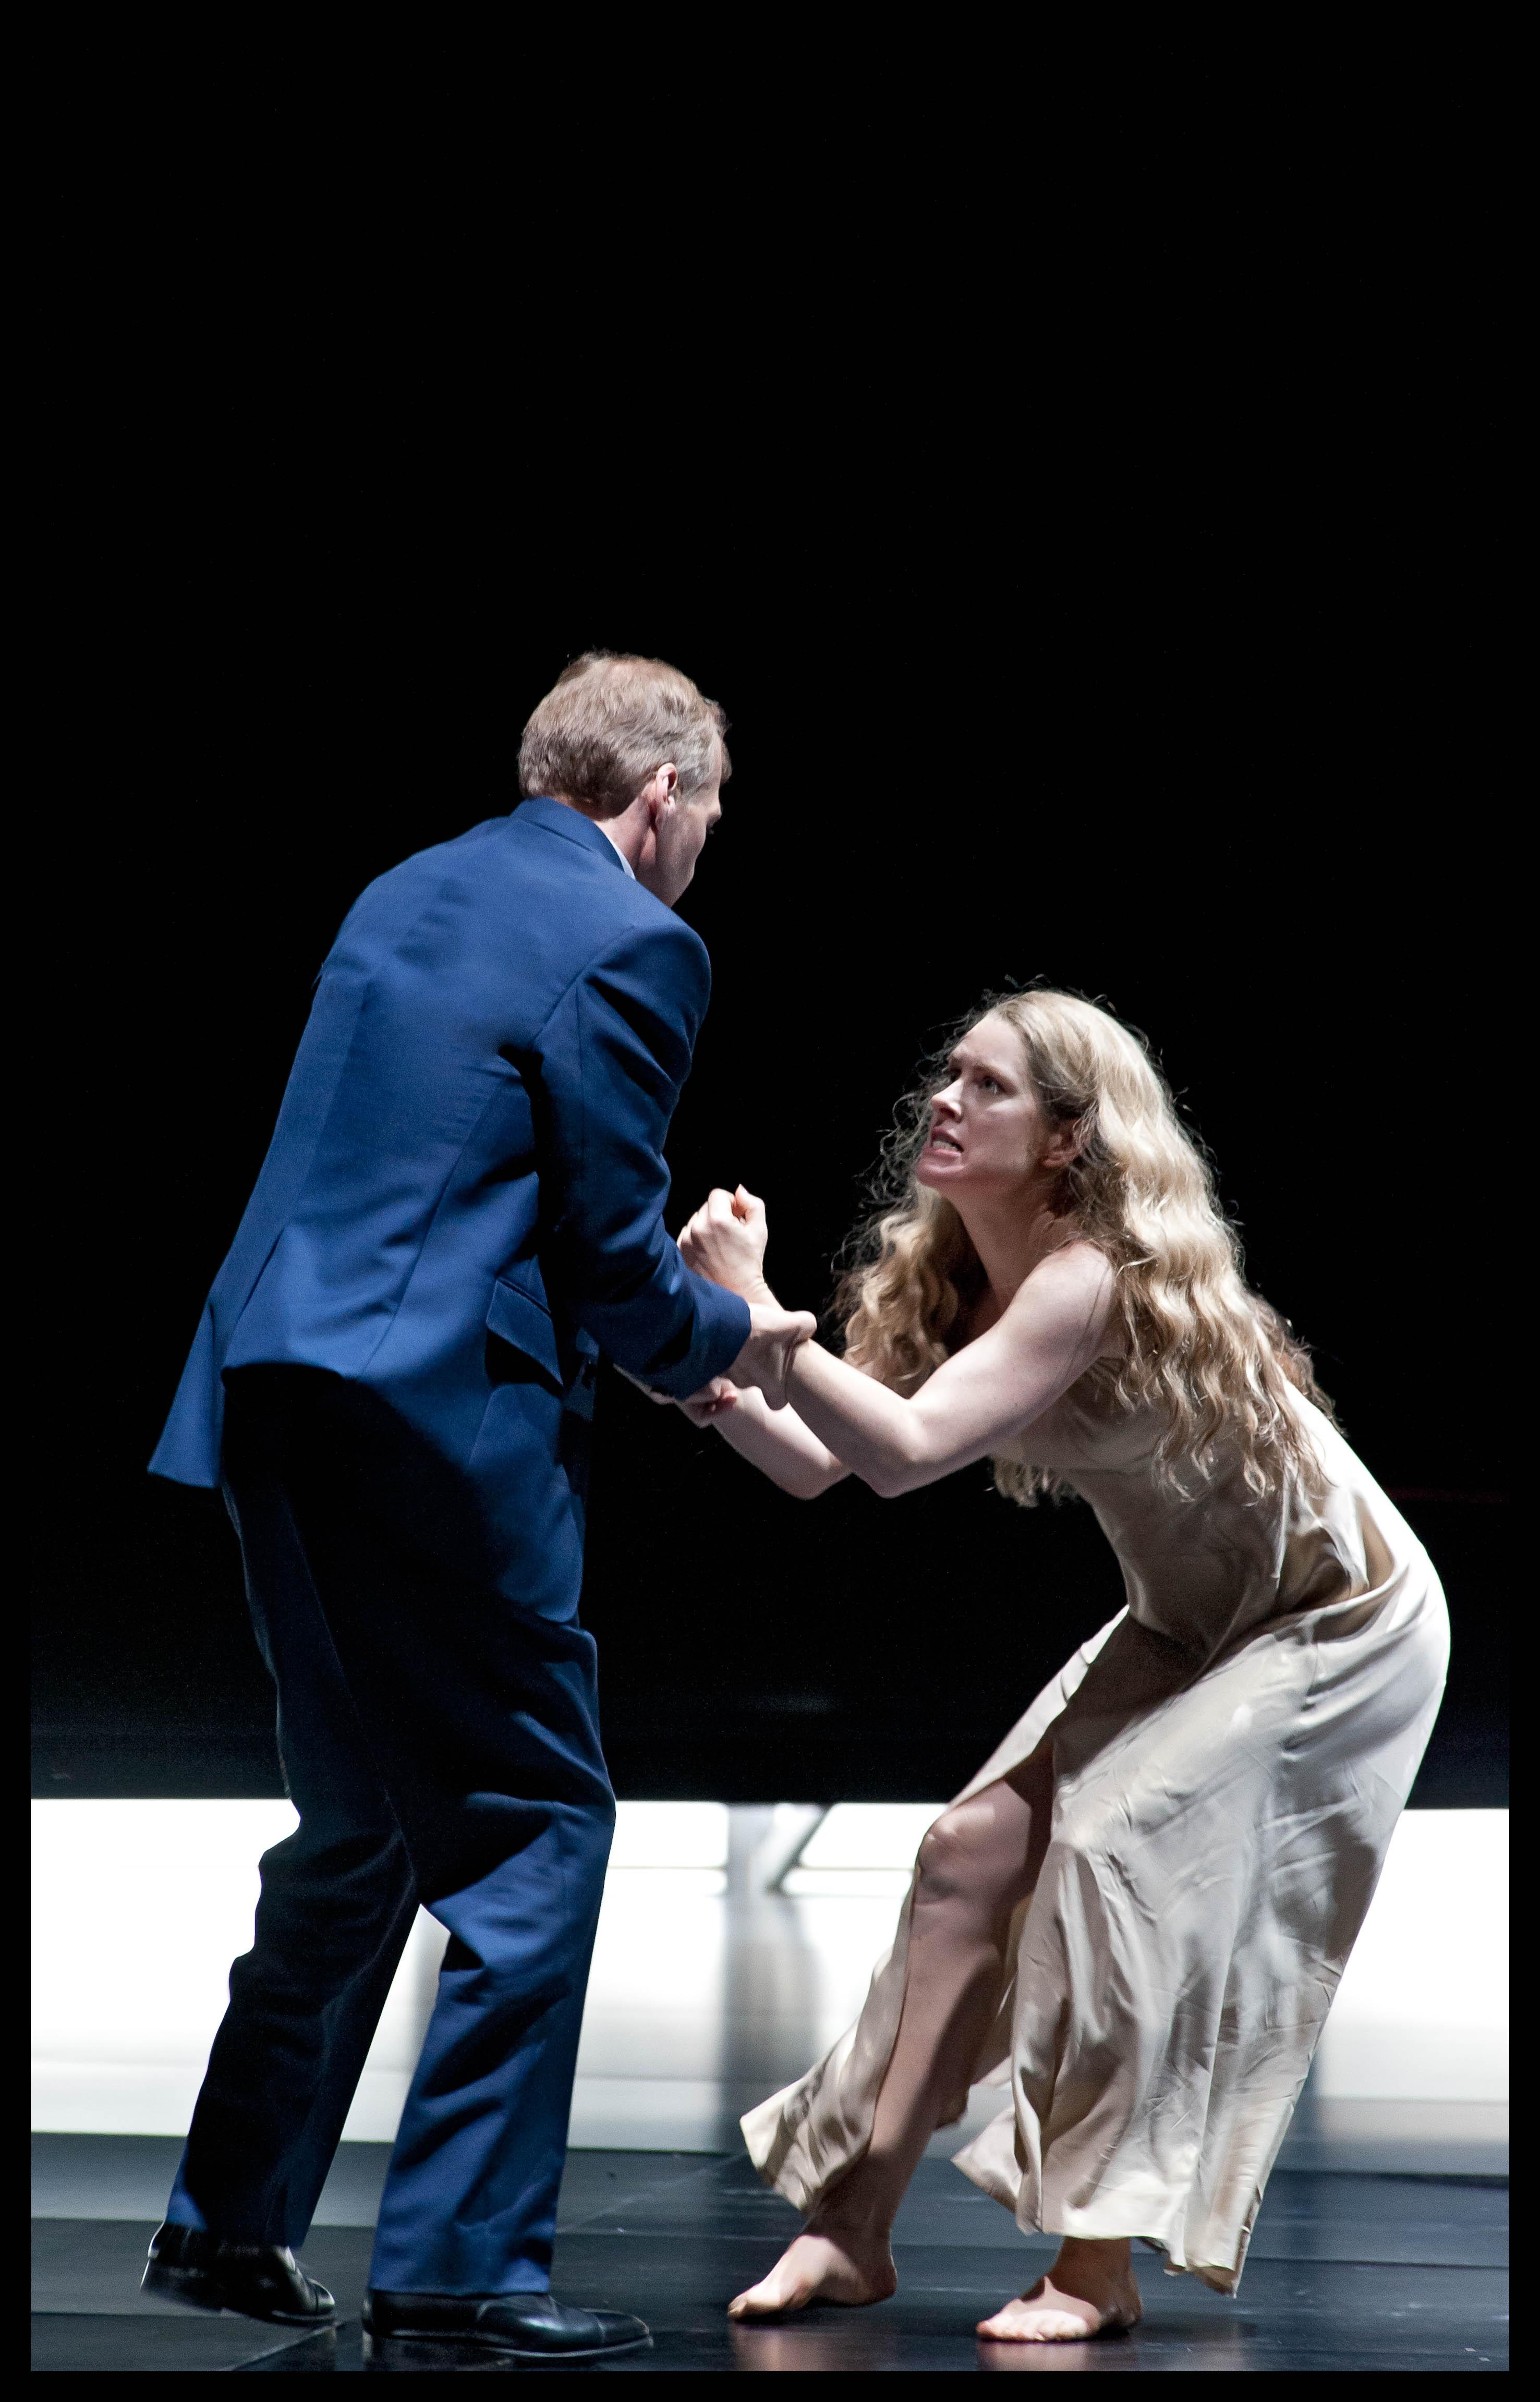 Malin Byström (Salome) & Lance Ryan (Herodes)